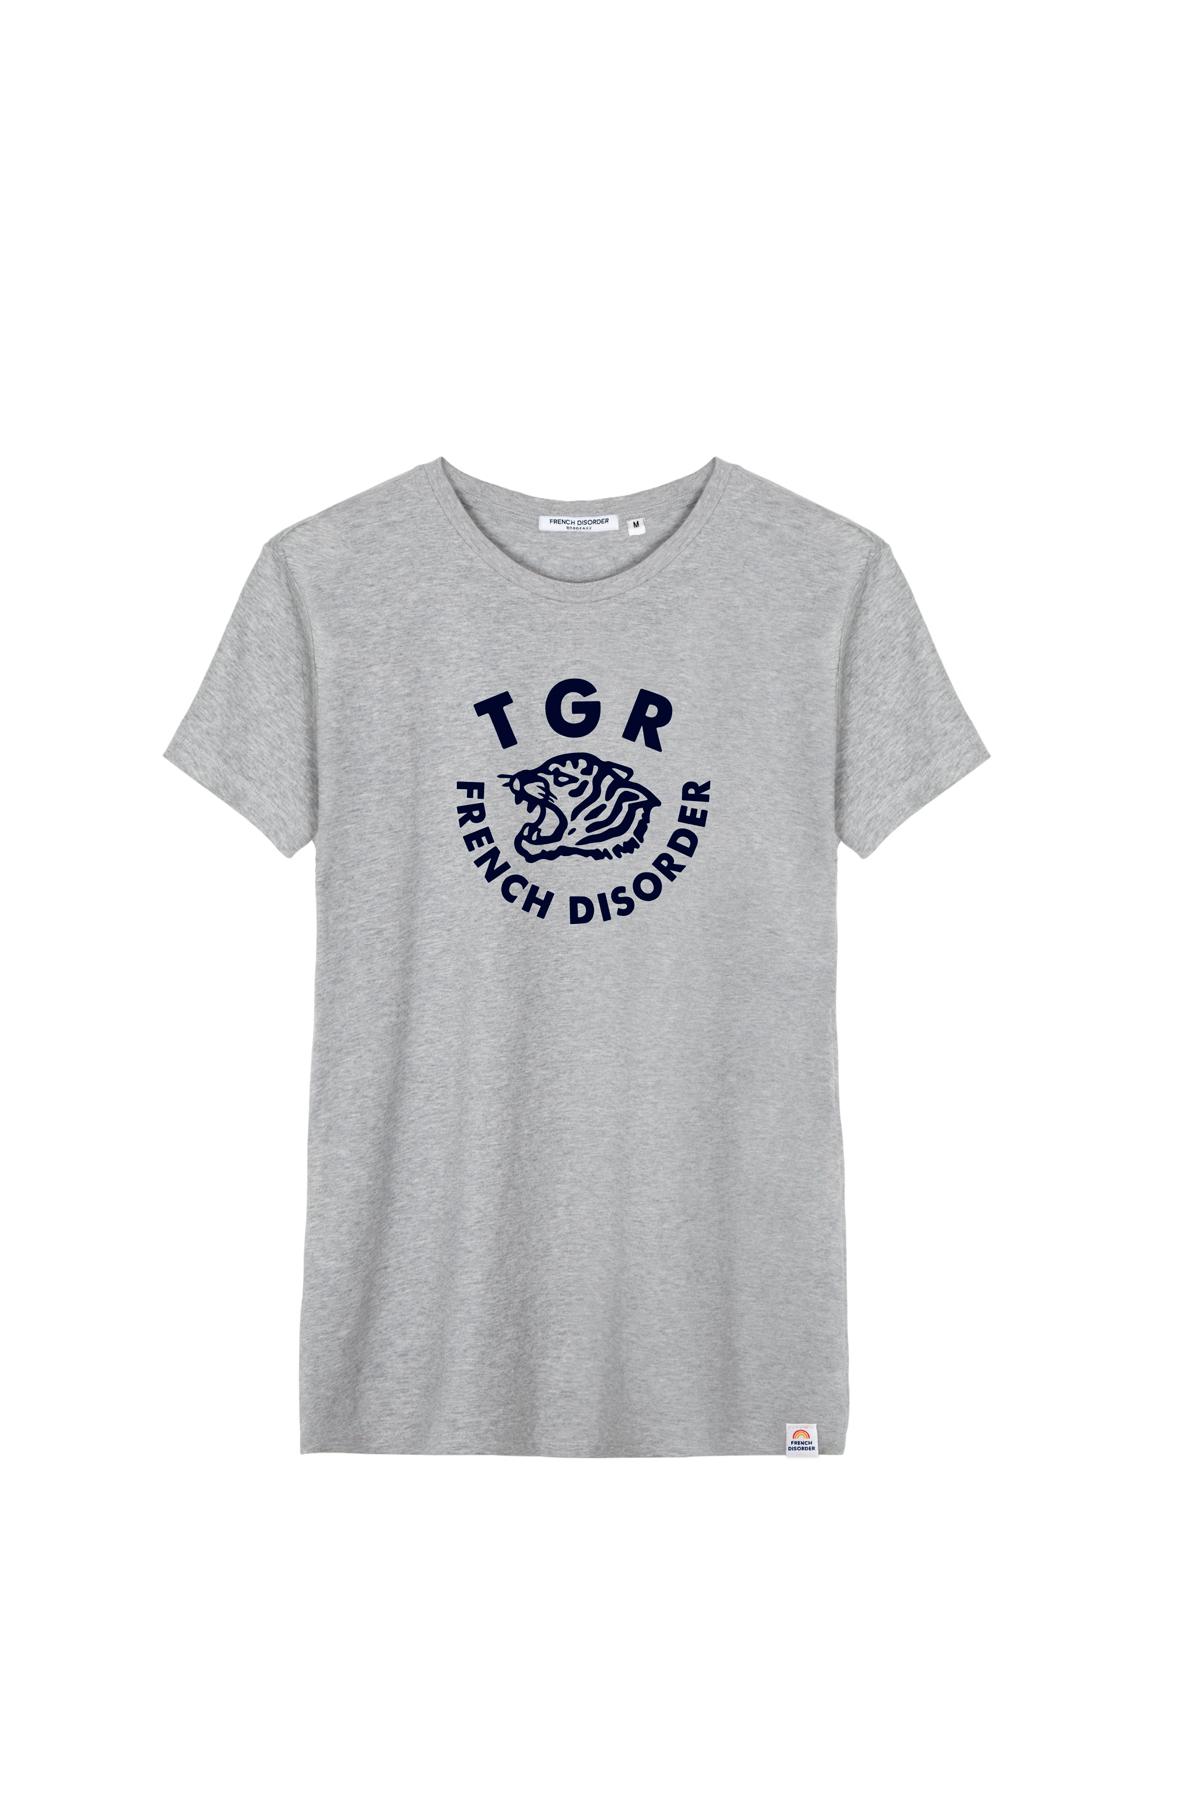 Photo de T-SHIRTS COL ROND T-shirt TIGER chez French Disorder